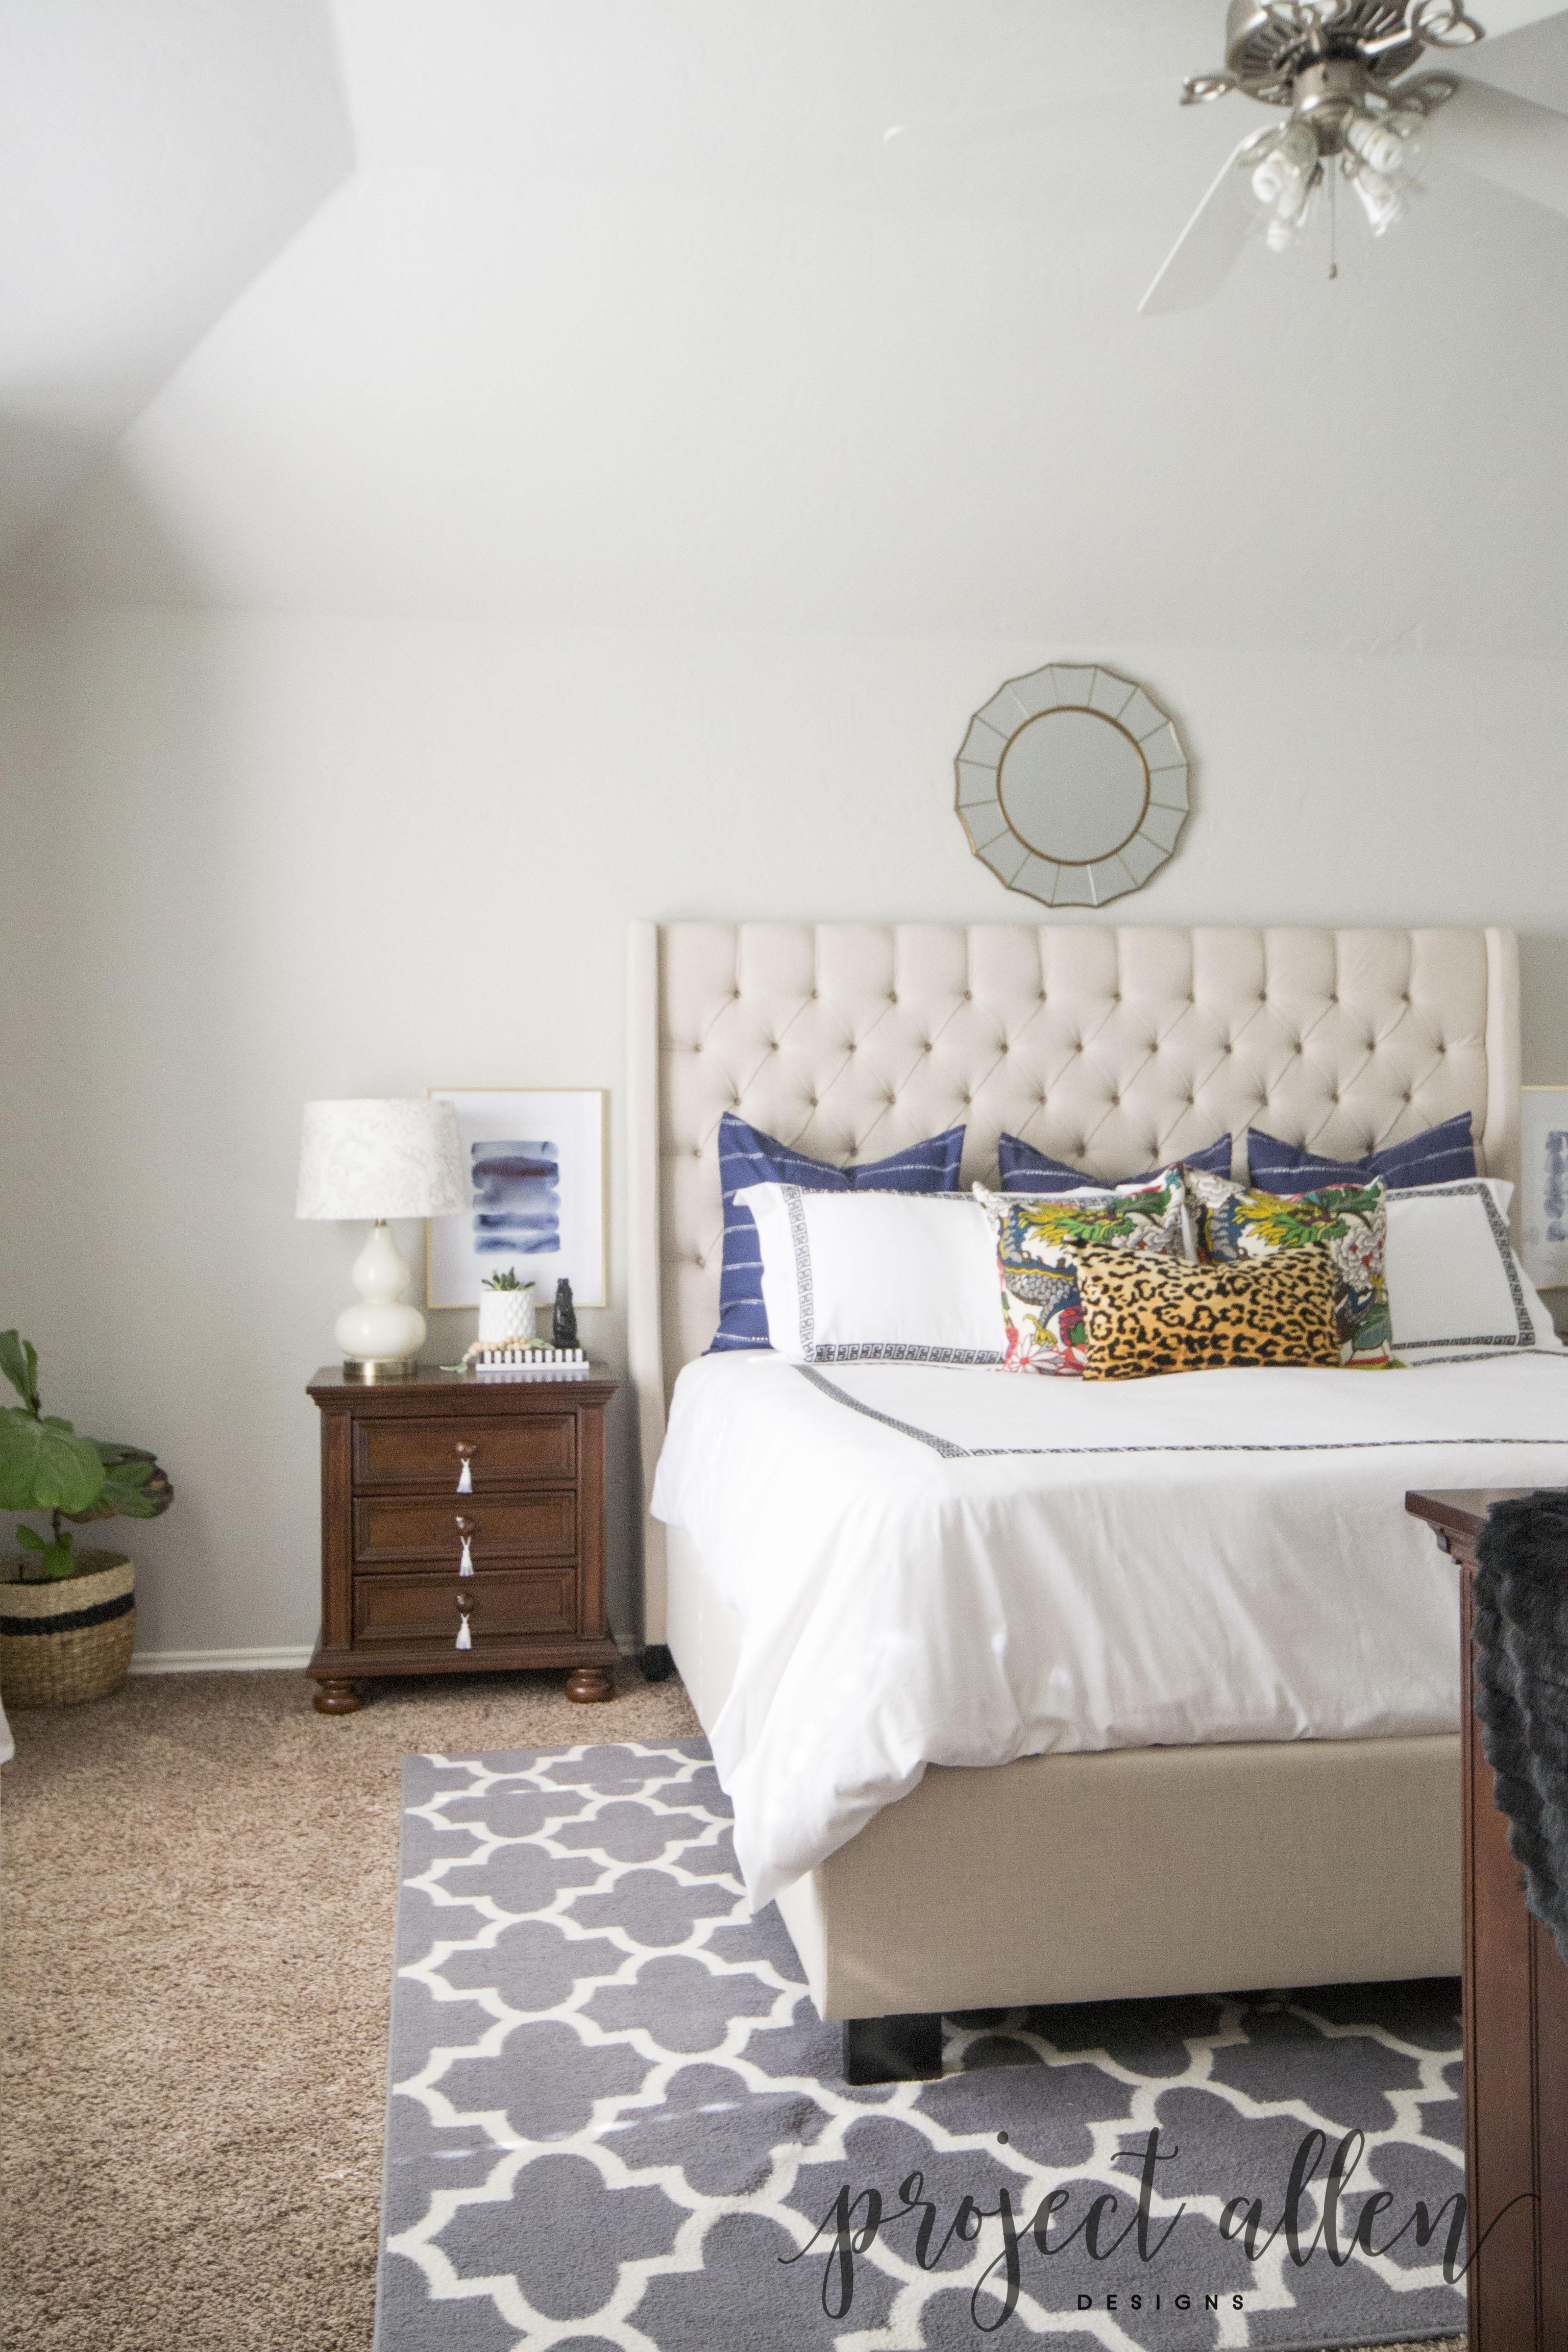 bedroom reveal bed navy pillows dragon pillows greek key bedding